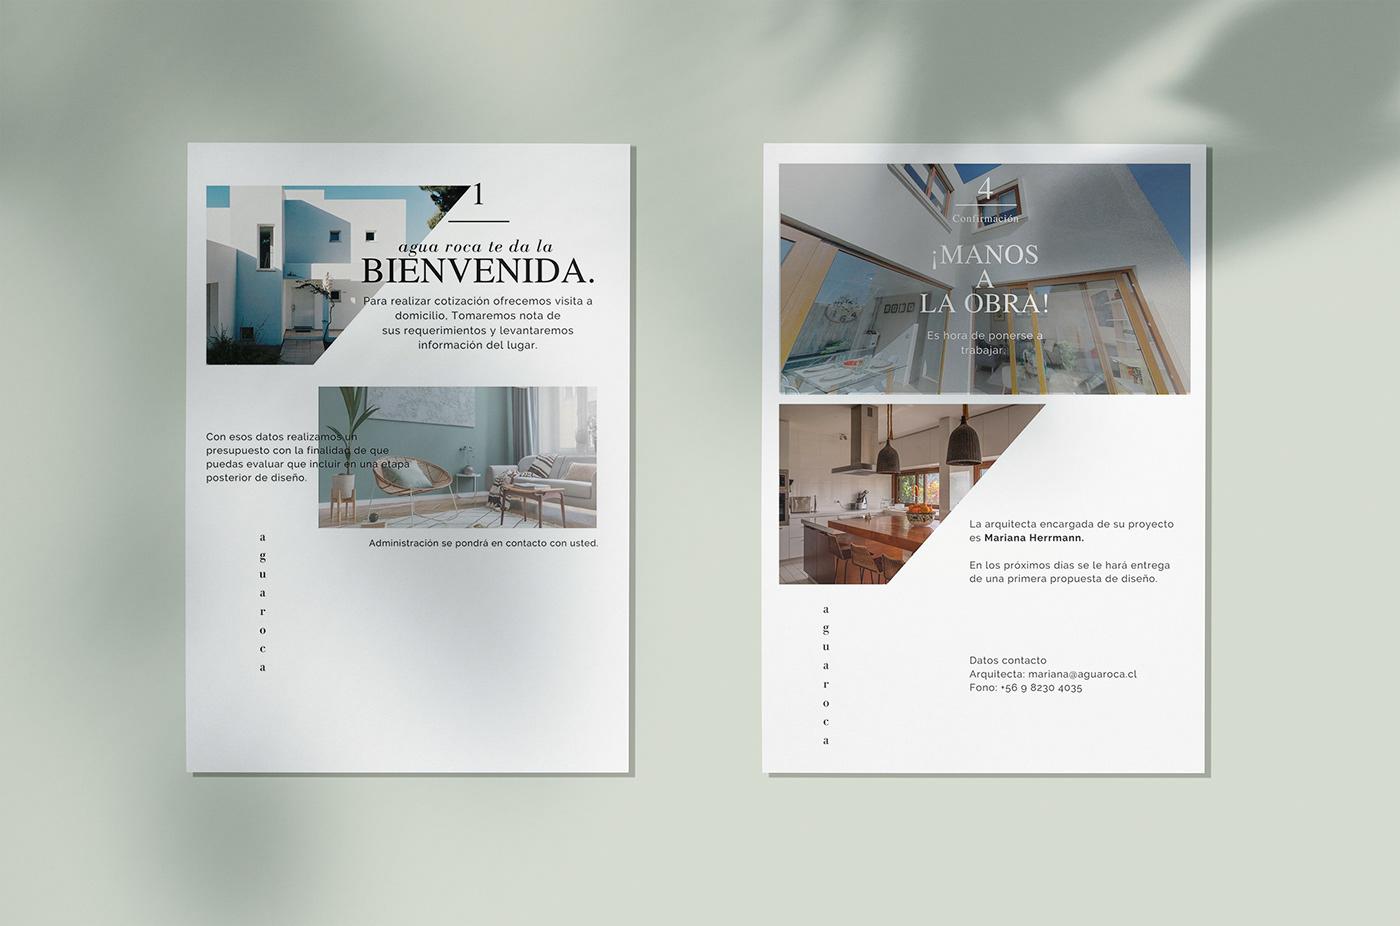 adobephotoshop architecture branding  design Figma Web Webdesign